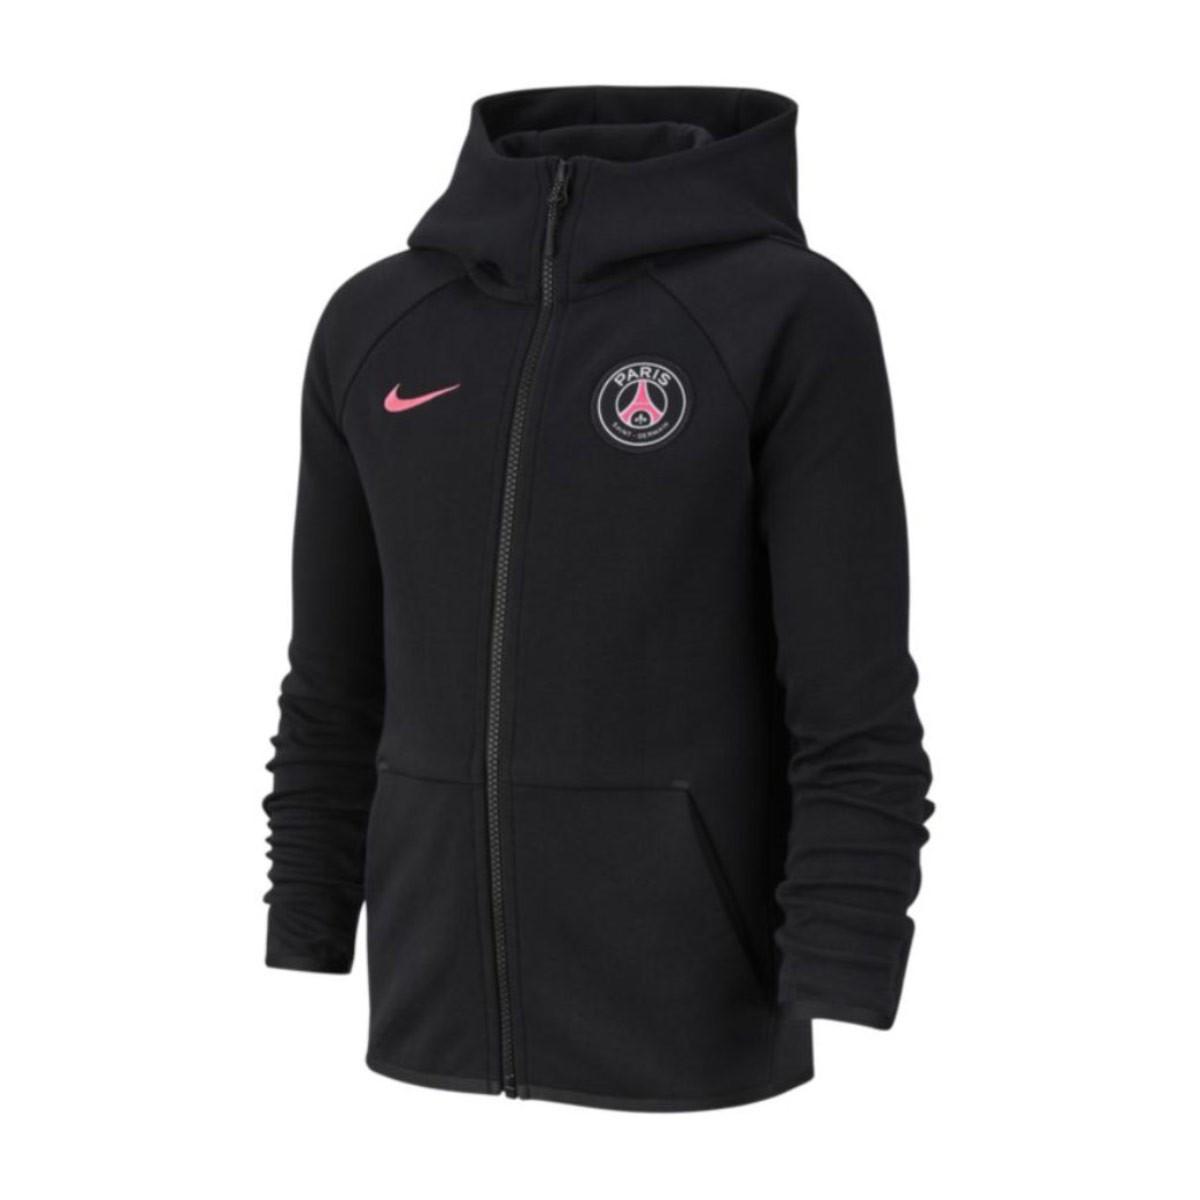 buy popular e90a1 afef9 Sudadera Paris Saint-Germain NSW Tech Fleece Essentials 2018-2019 Niño  Black-Hyper pink